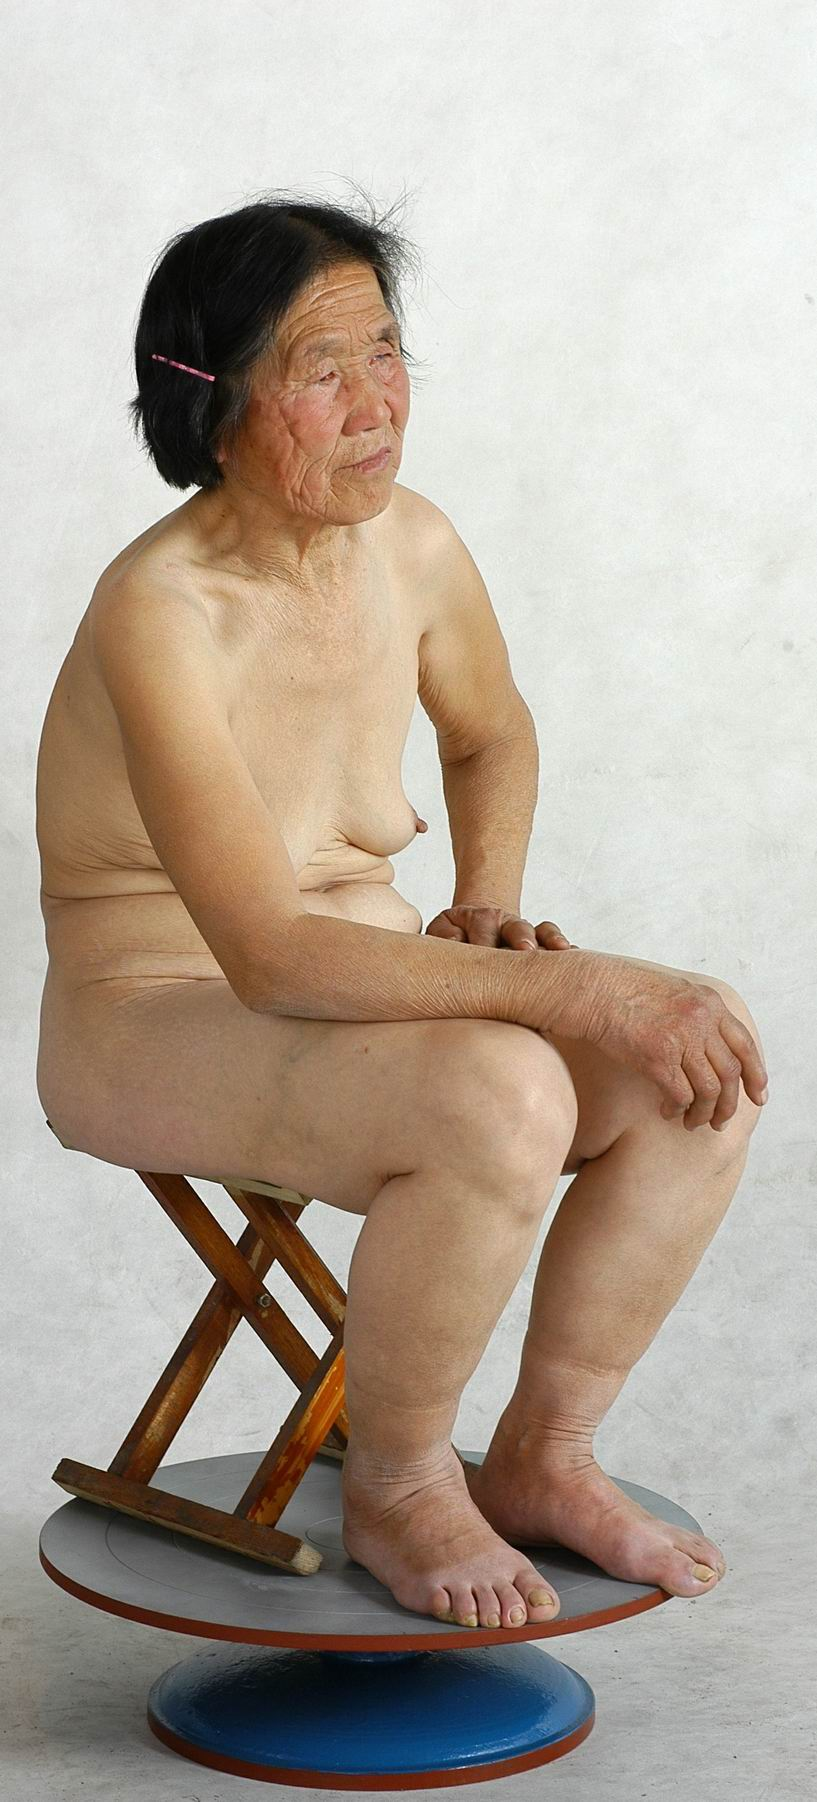 asian granny porn